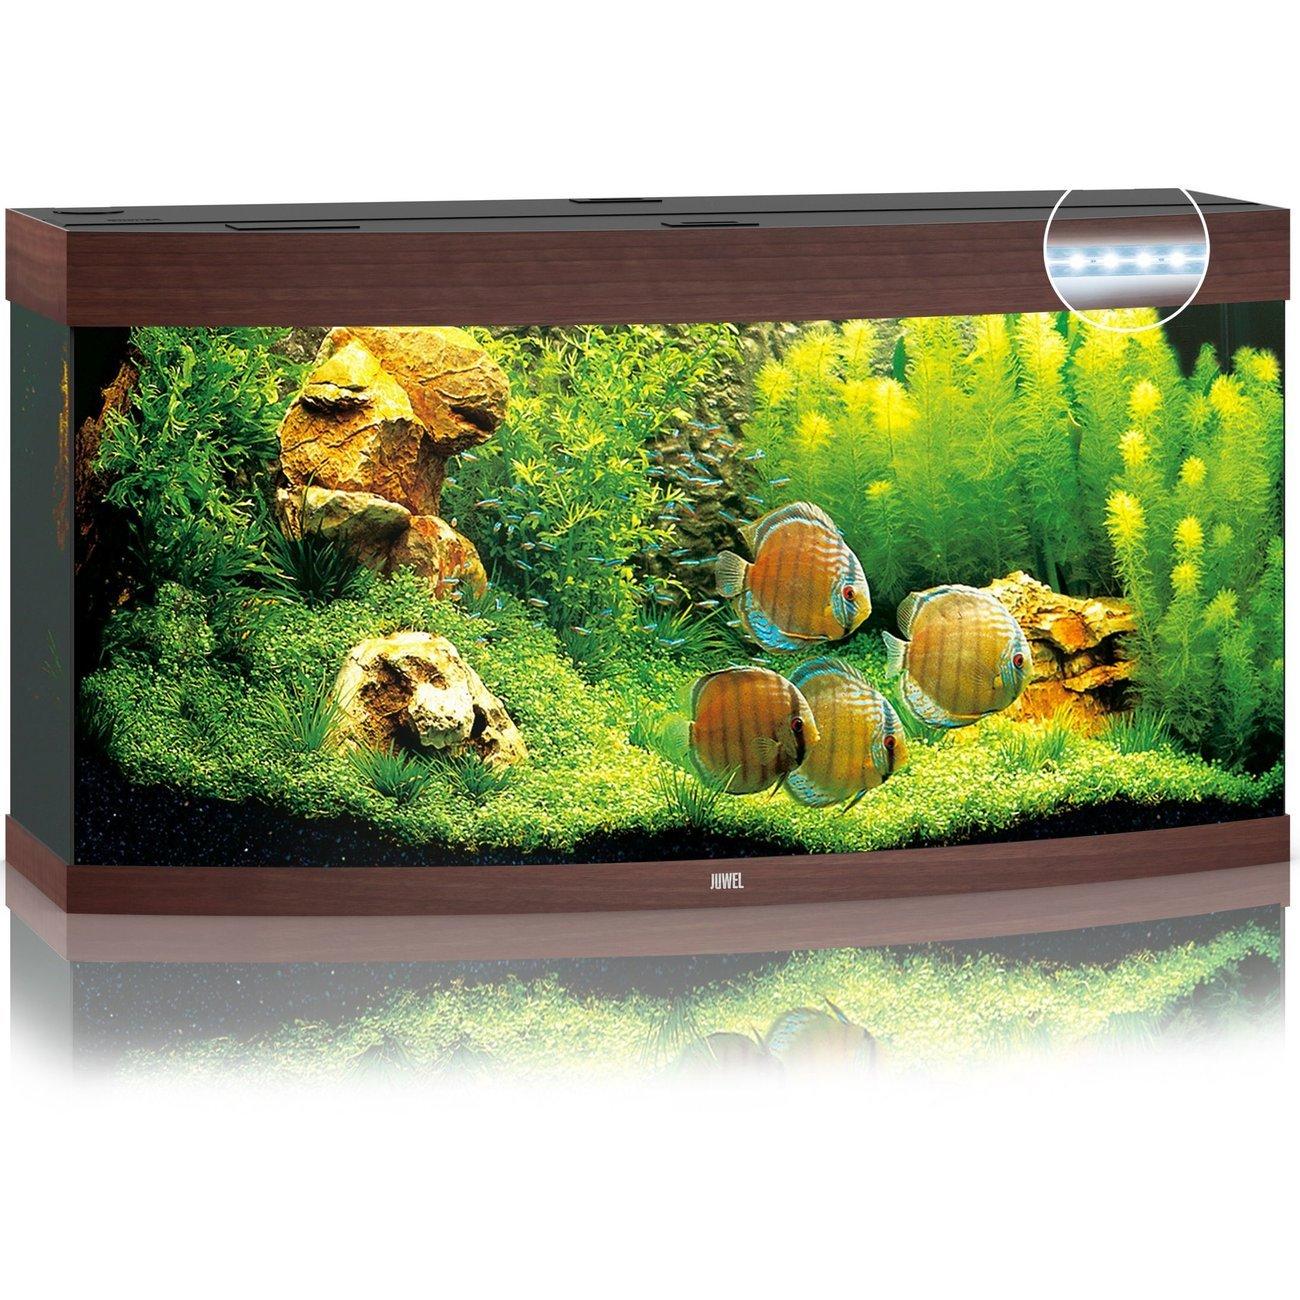 Juwel Vision 260 LED Aquarium, Bild 2